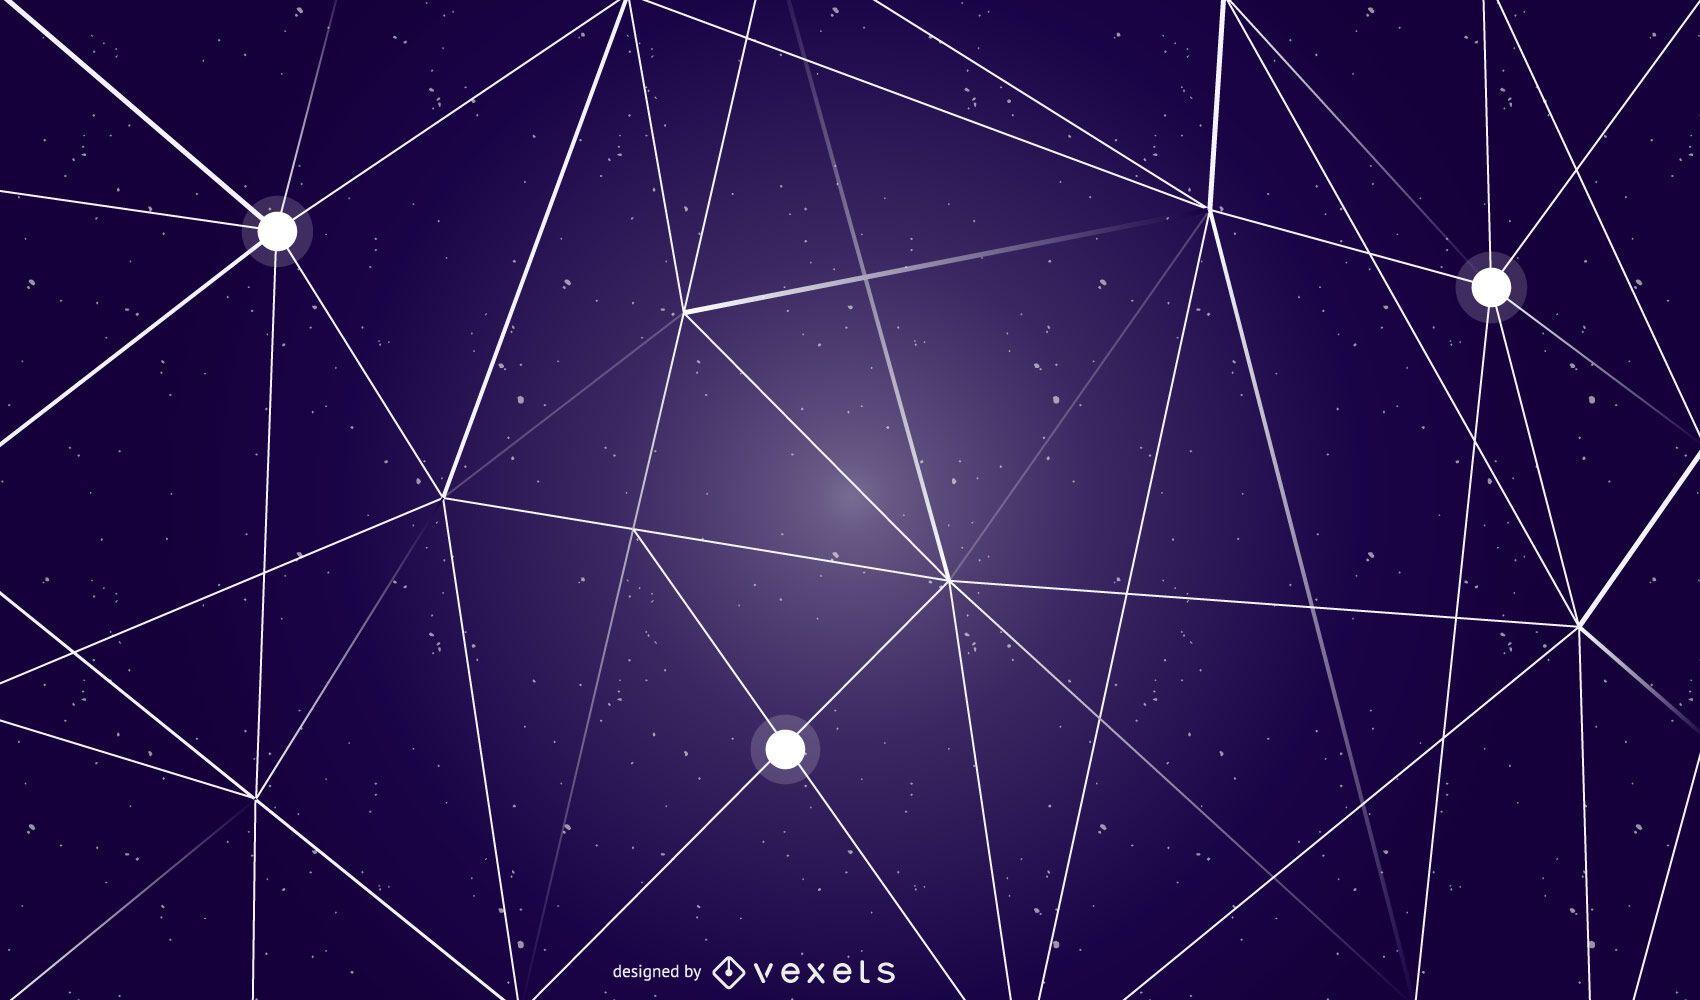 Abstraktes geometrisches Himmelshintergrunddesign